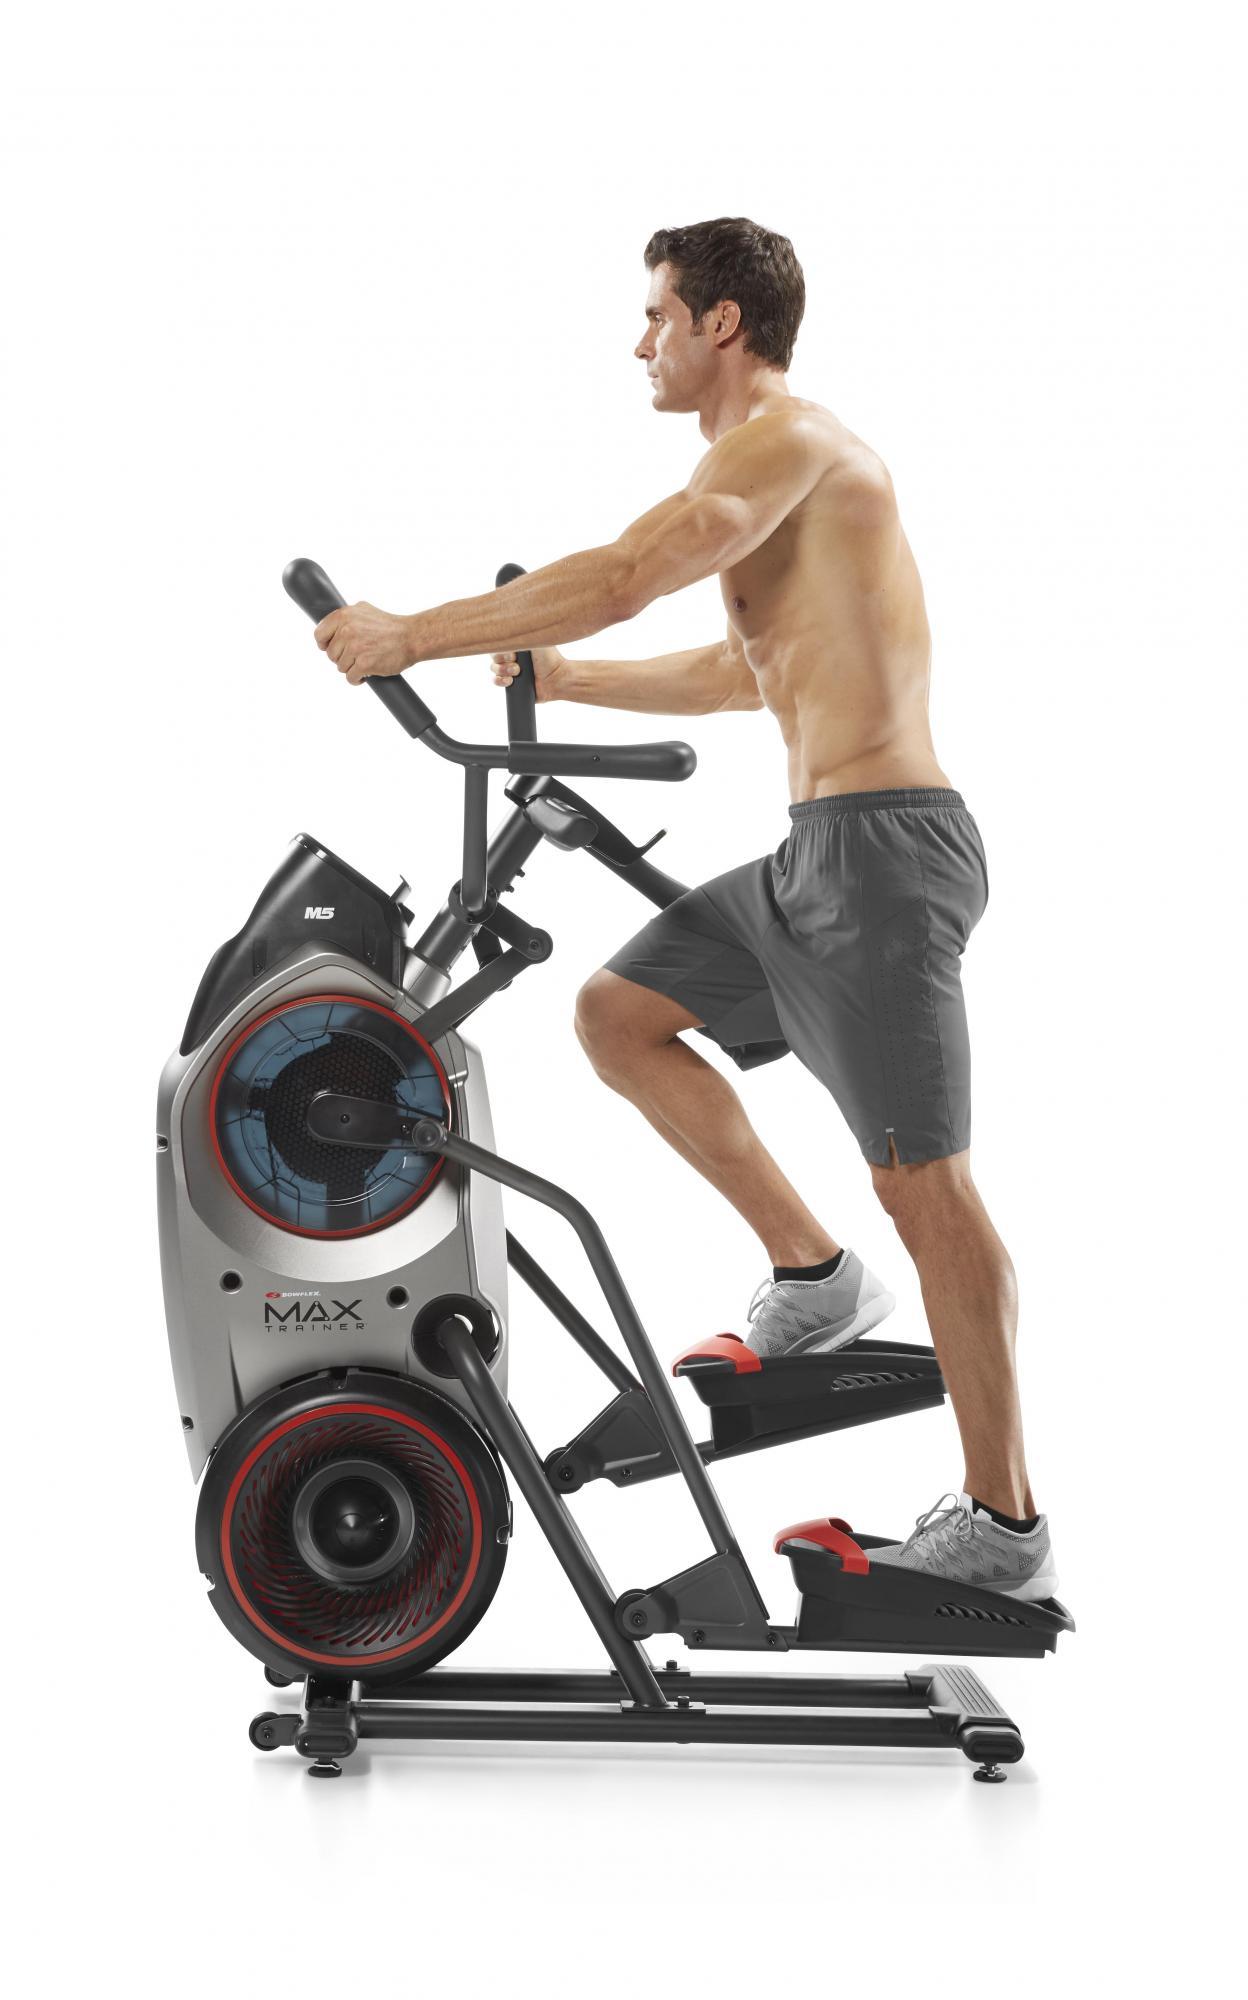 Max Trainer M5 >> MAX Trainer, bowflex, calorie, stepper, ellittica